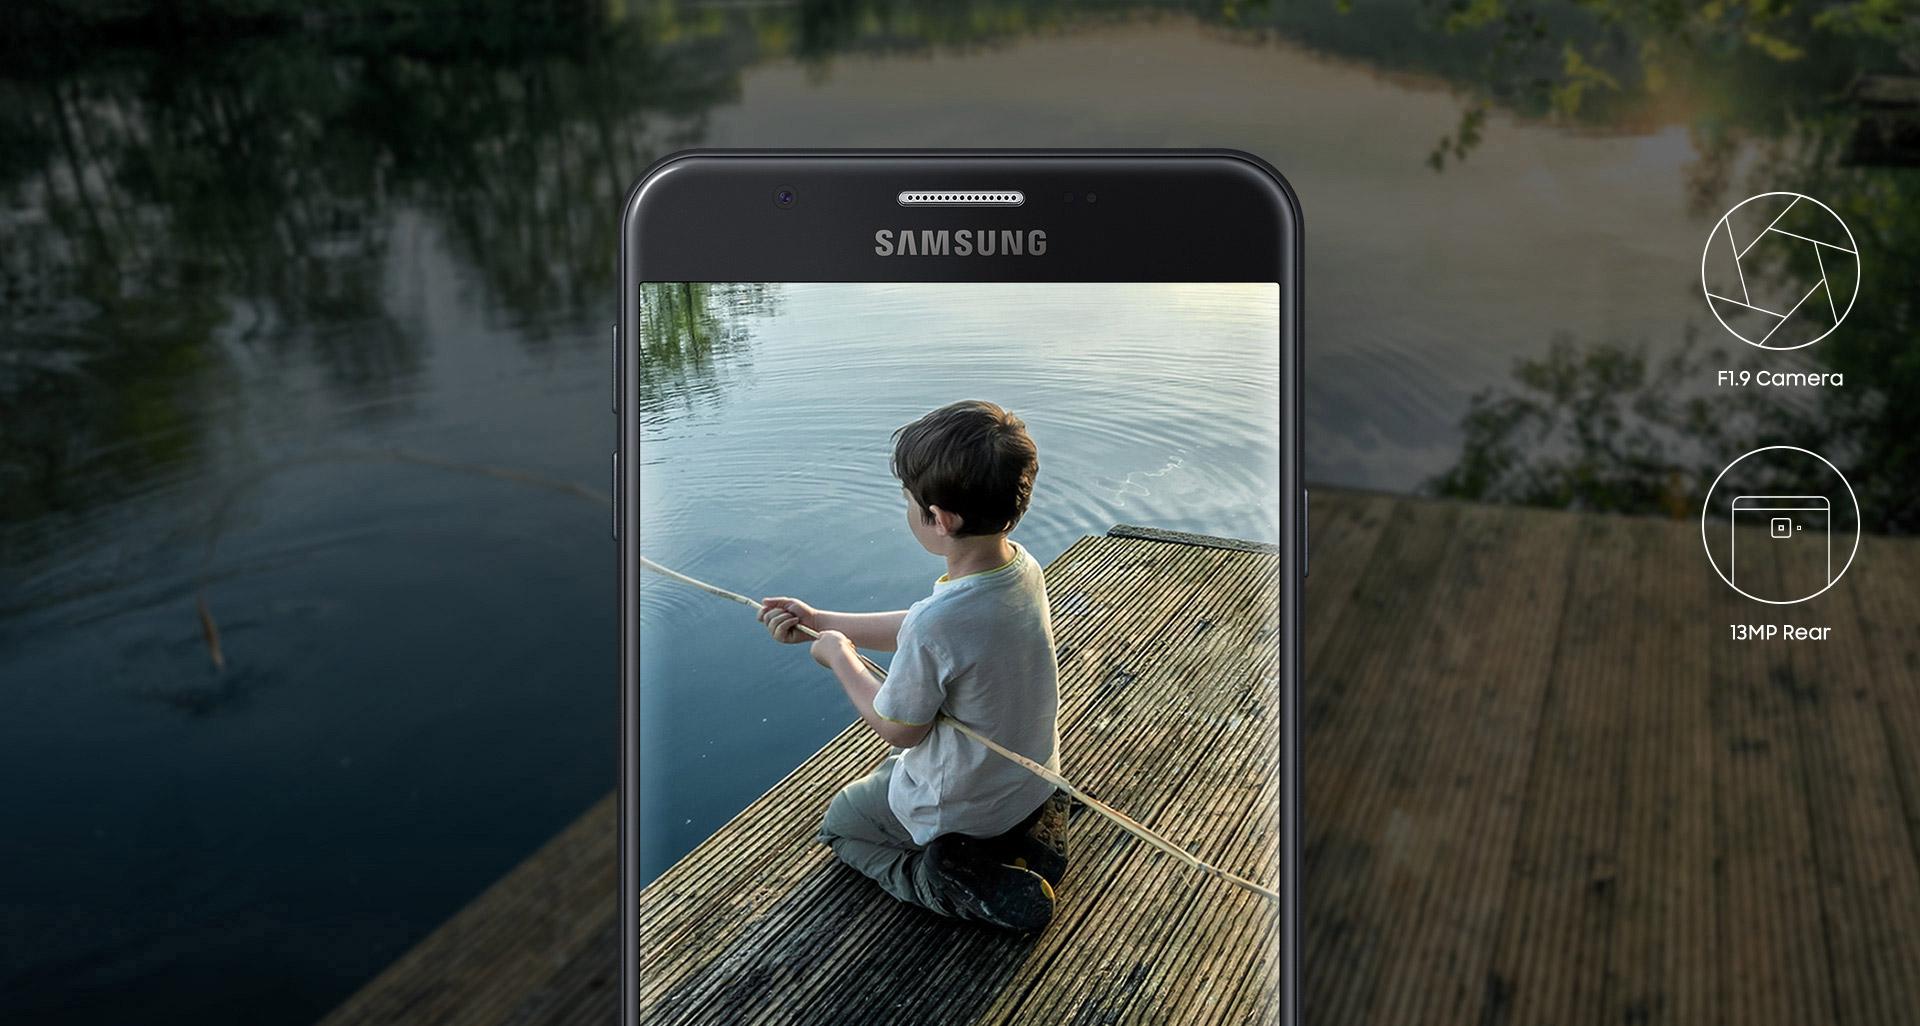 Samsung Galaxy J7 Prime 16GB Gold - Official Warranty